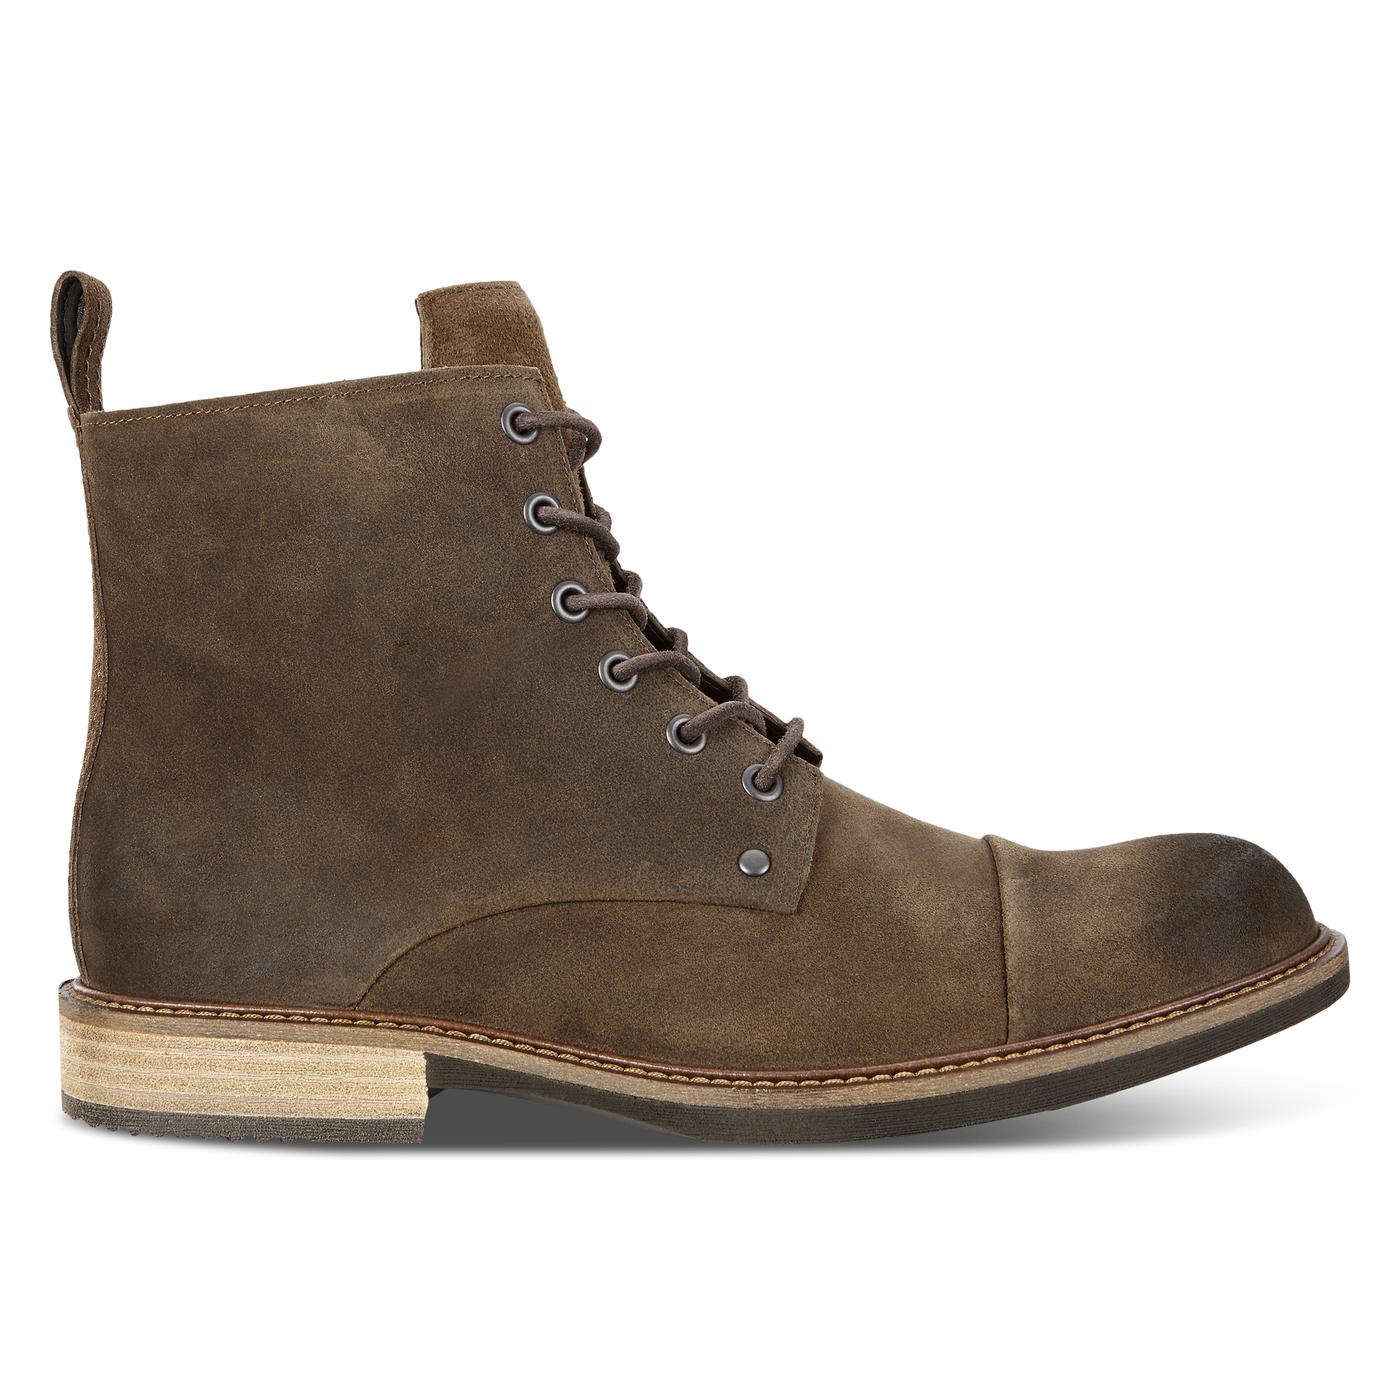 1b93b126 ECCO KENTON Mid-cut Boot